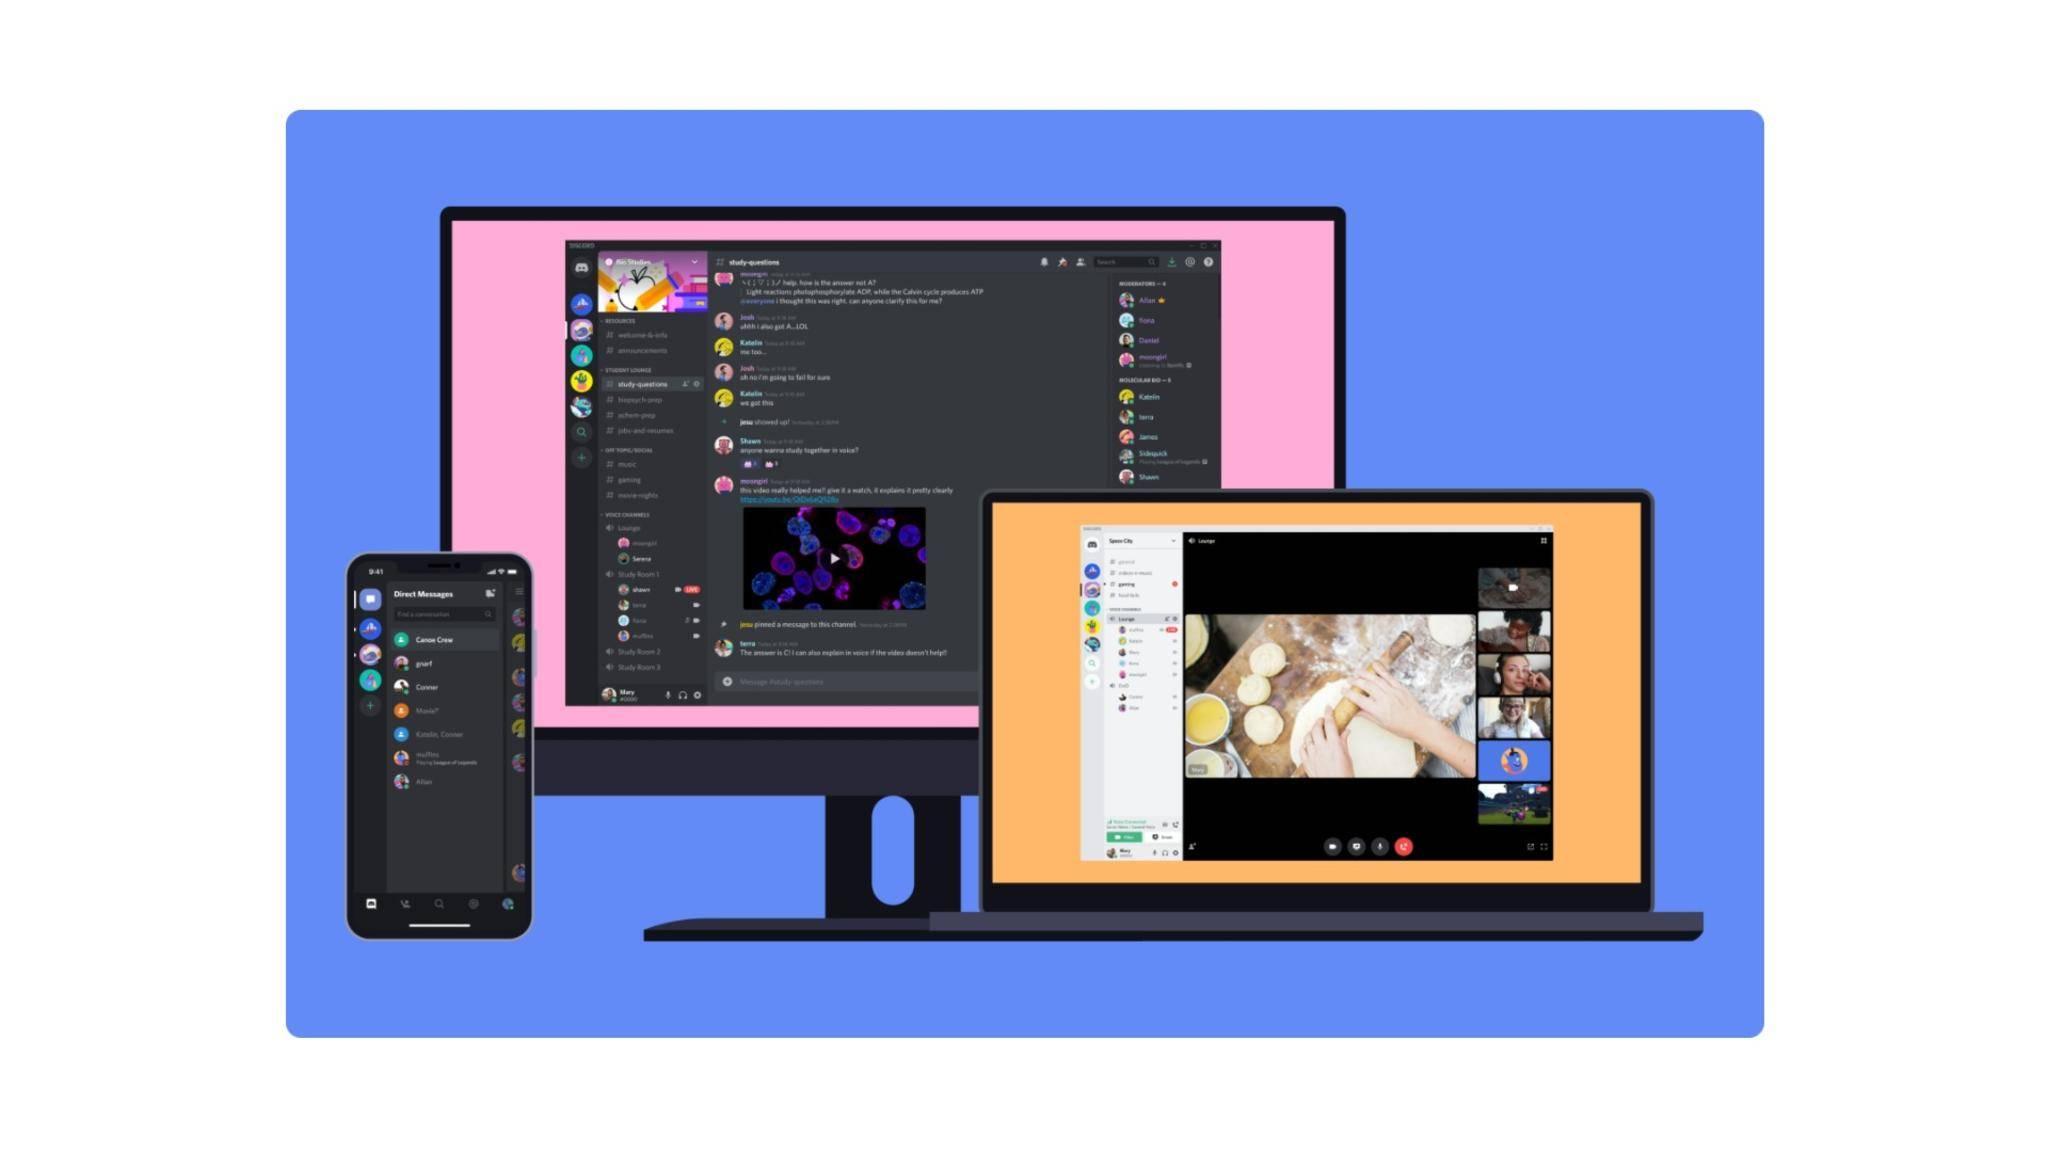 discord-systeme-handy-pc-laptop